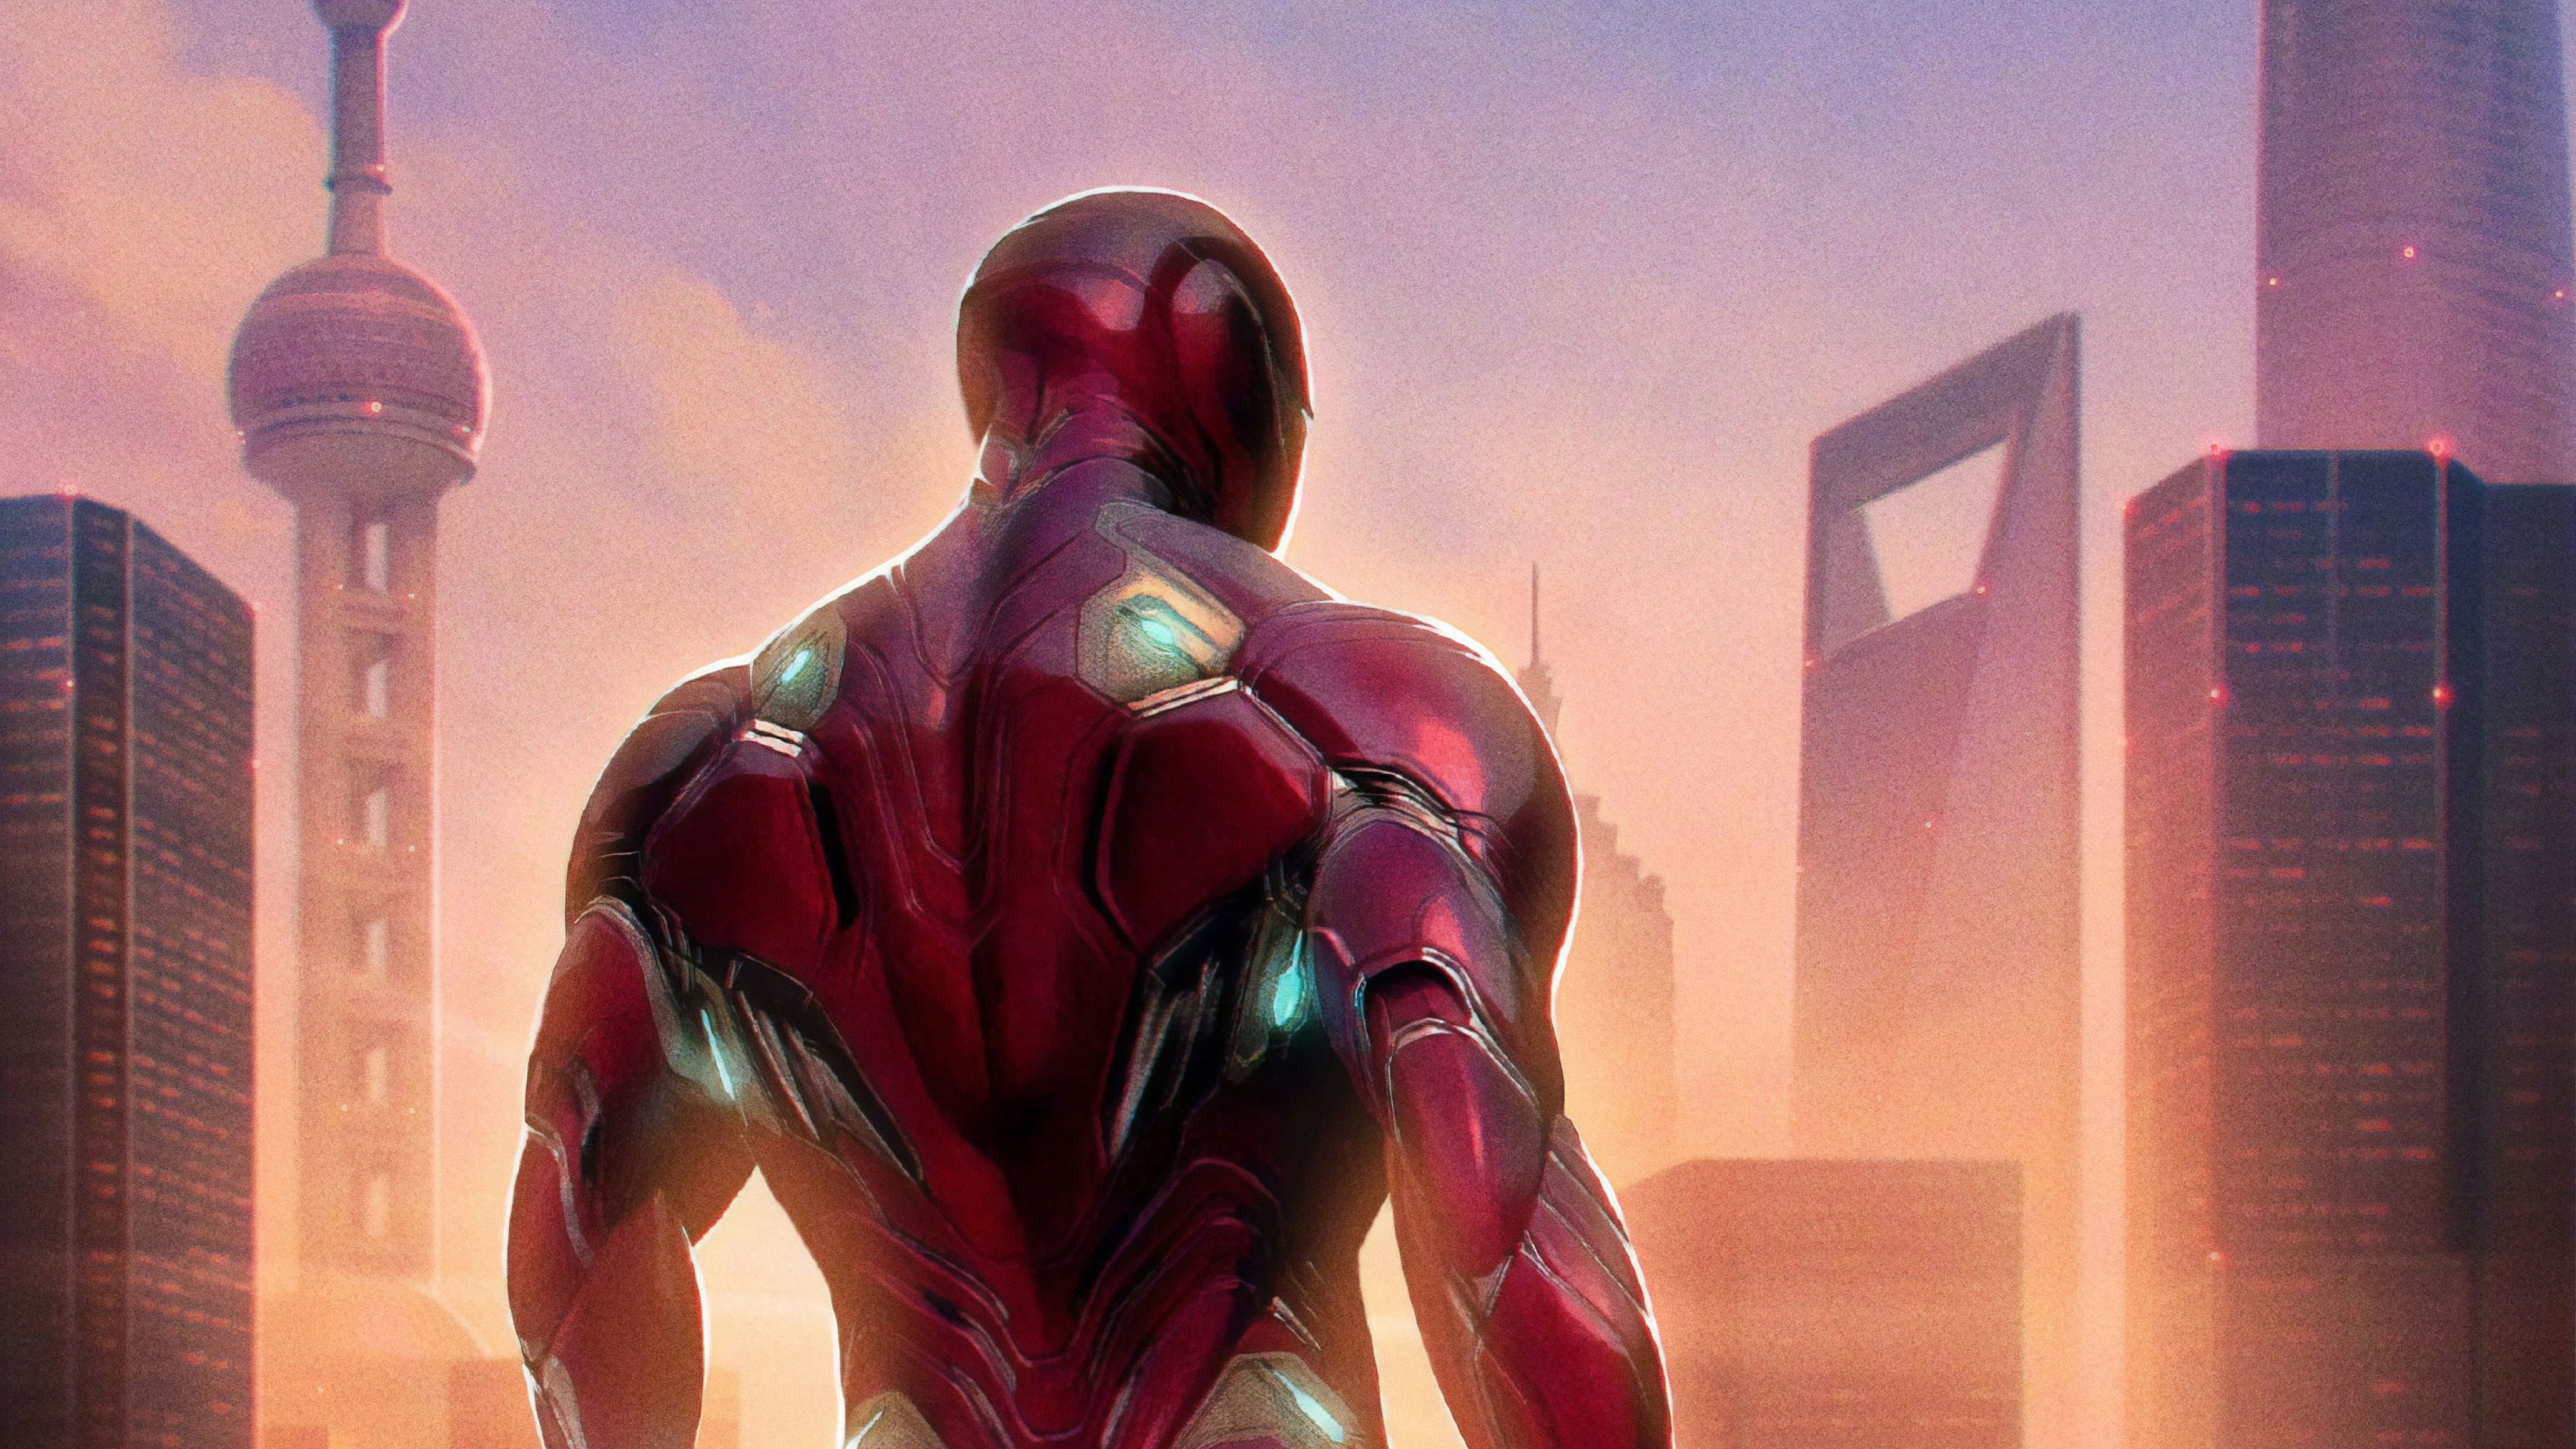 3840x2160 Iron Man Avengers Endgame 4k Wallpaper Hd Movies